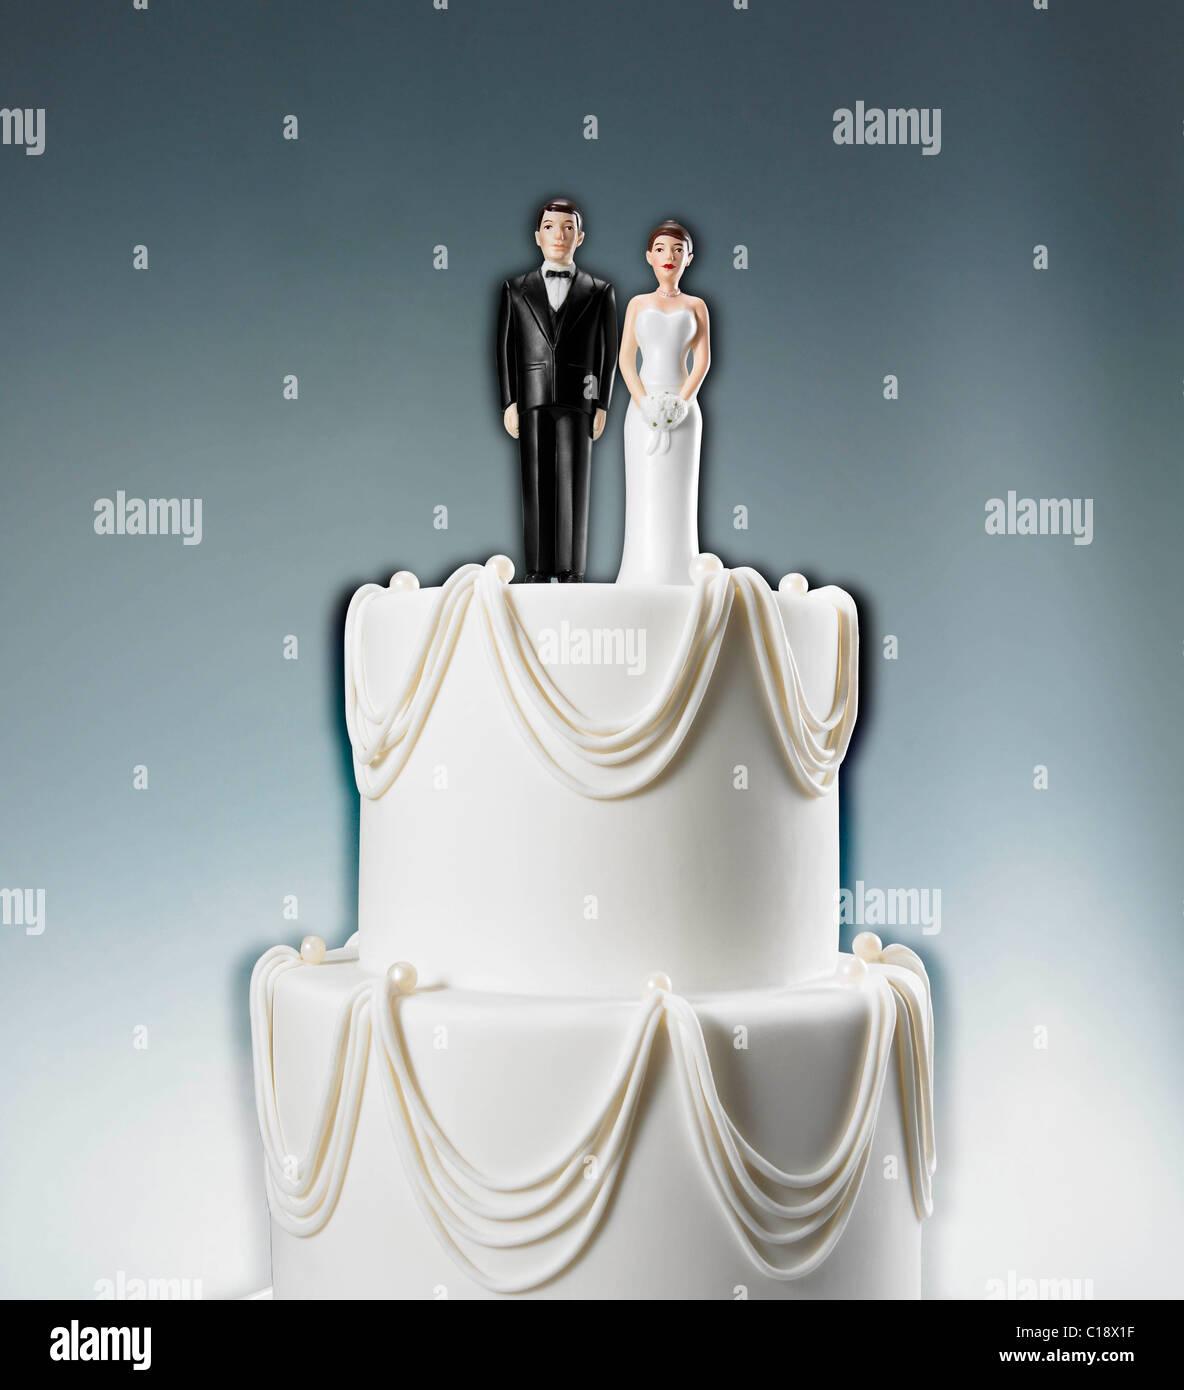 Skip Caplan ¬ © 2011 35 West 31 st. RM. 1001 NewYork, ny 10001 212: 463: 0541 Hochzeitstorte mit Braut Stockbild